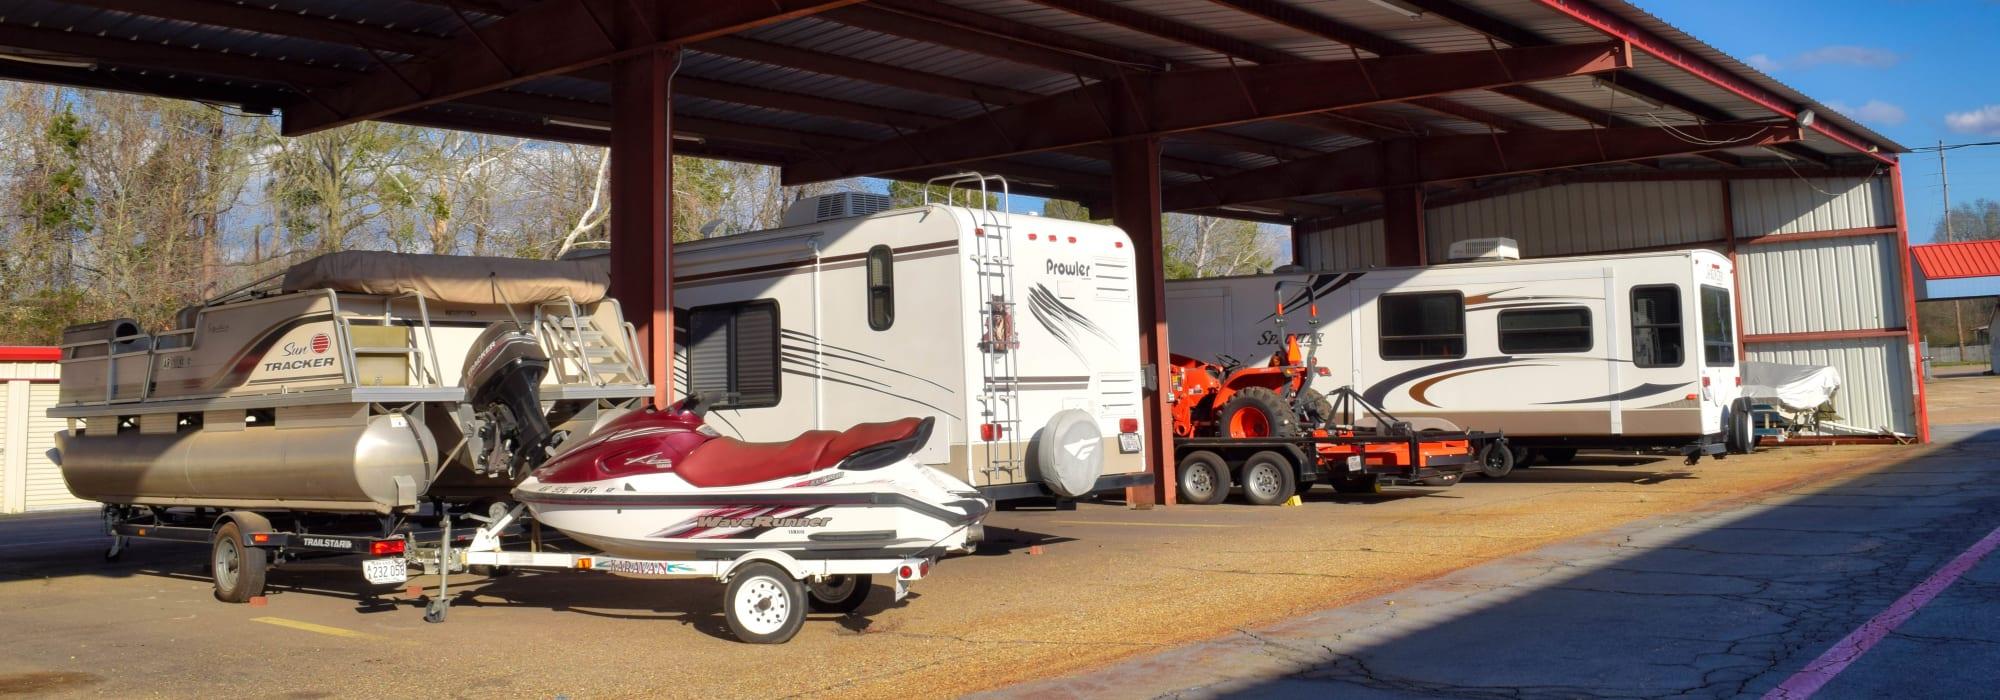 RV, Auto, & Boat Storage at Lockaway Storage in Texarkana, Texas